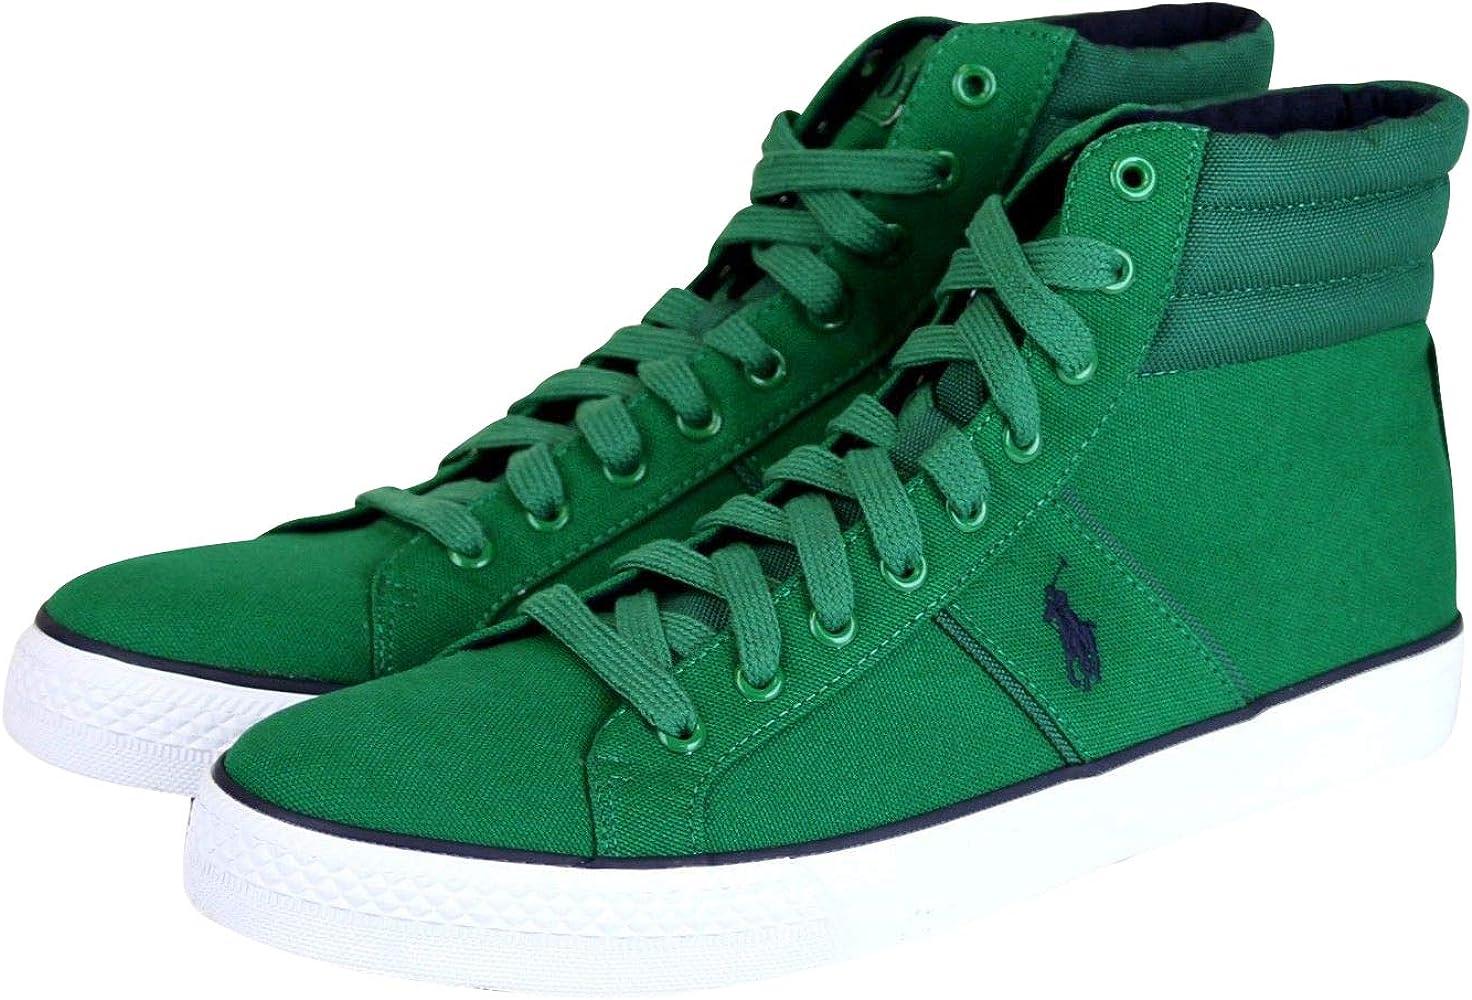 Memorizzare pessimistico Disperato  Amazon.com | Polo Ralph Lauren Men's High Top Bawtry Green Canvas Sneaker  with Logo (12 US) | Shoes